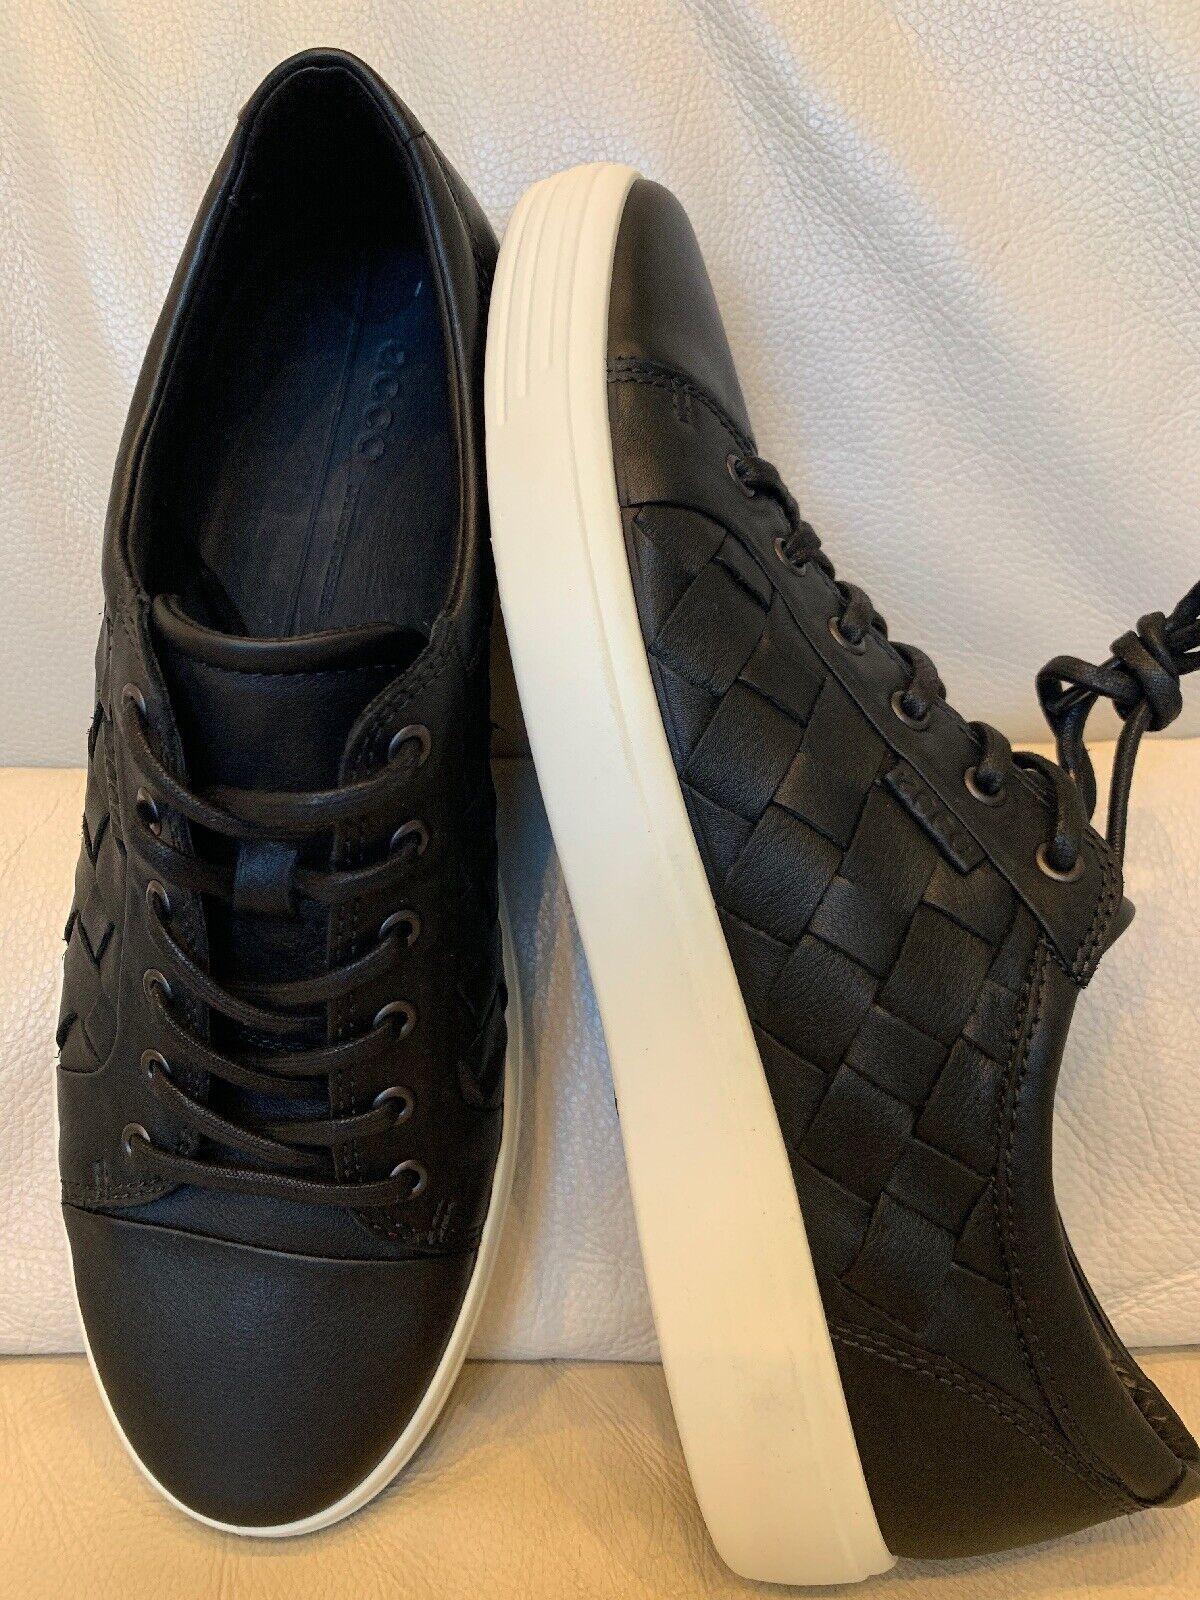 ecco black leather sneakers